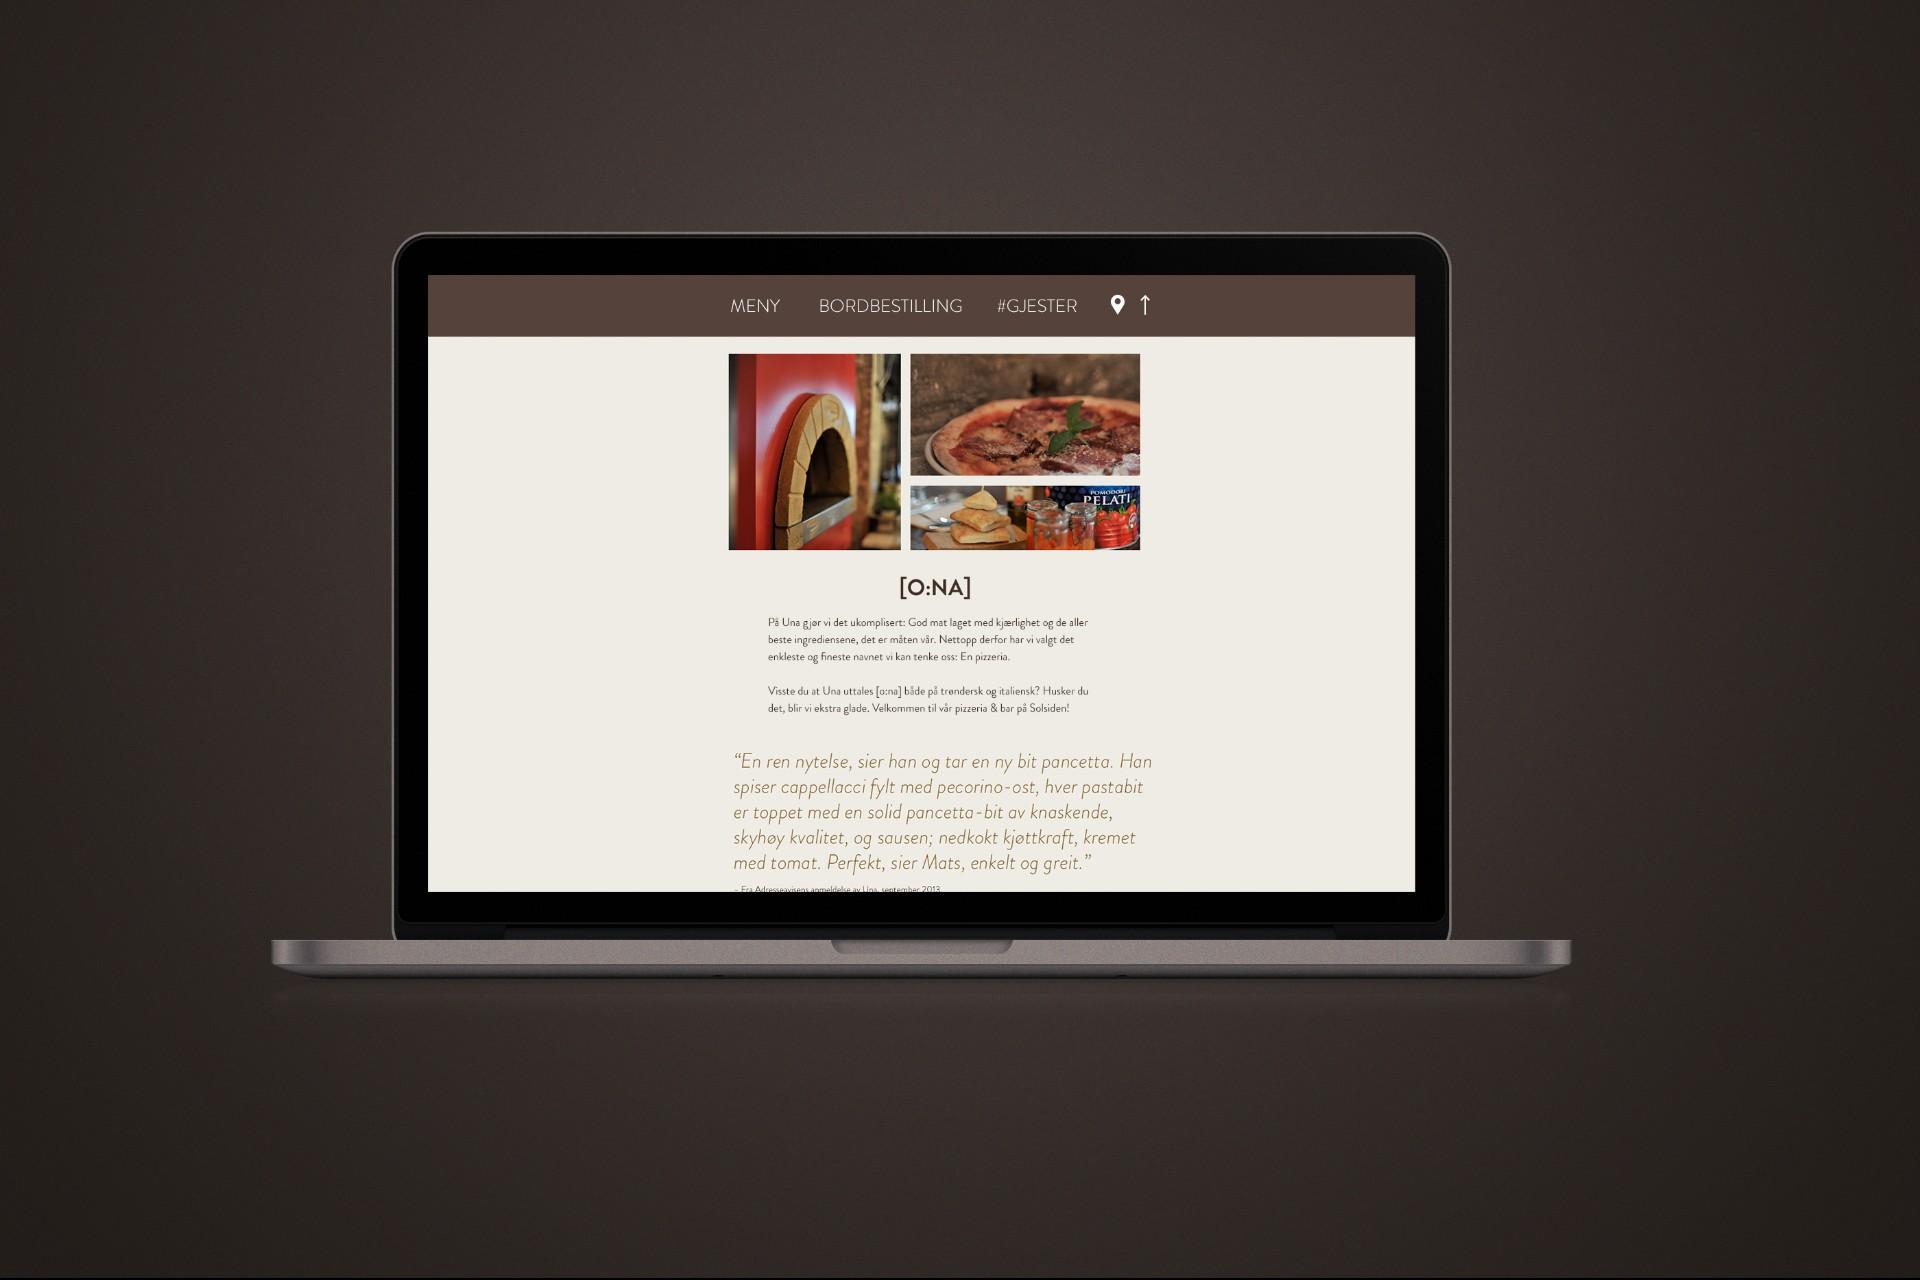 UnaPizzeria_09_desktop6.jpg